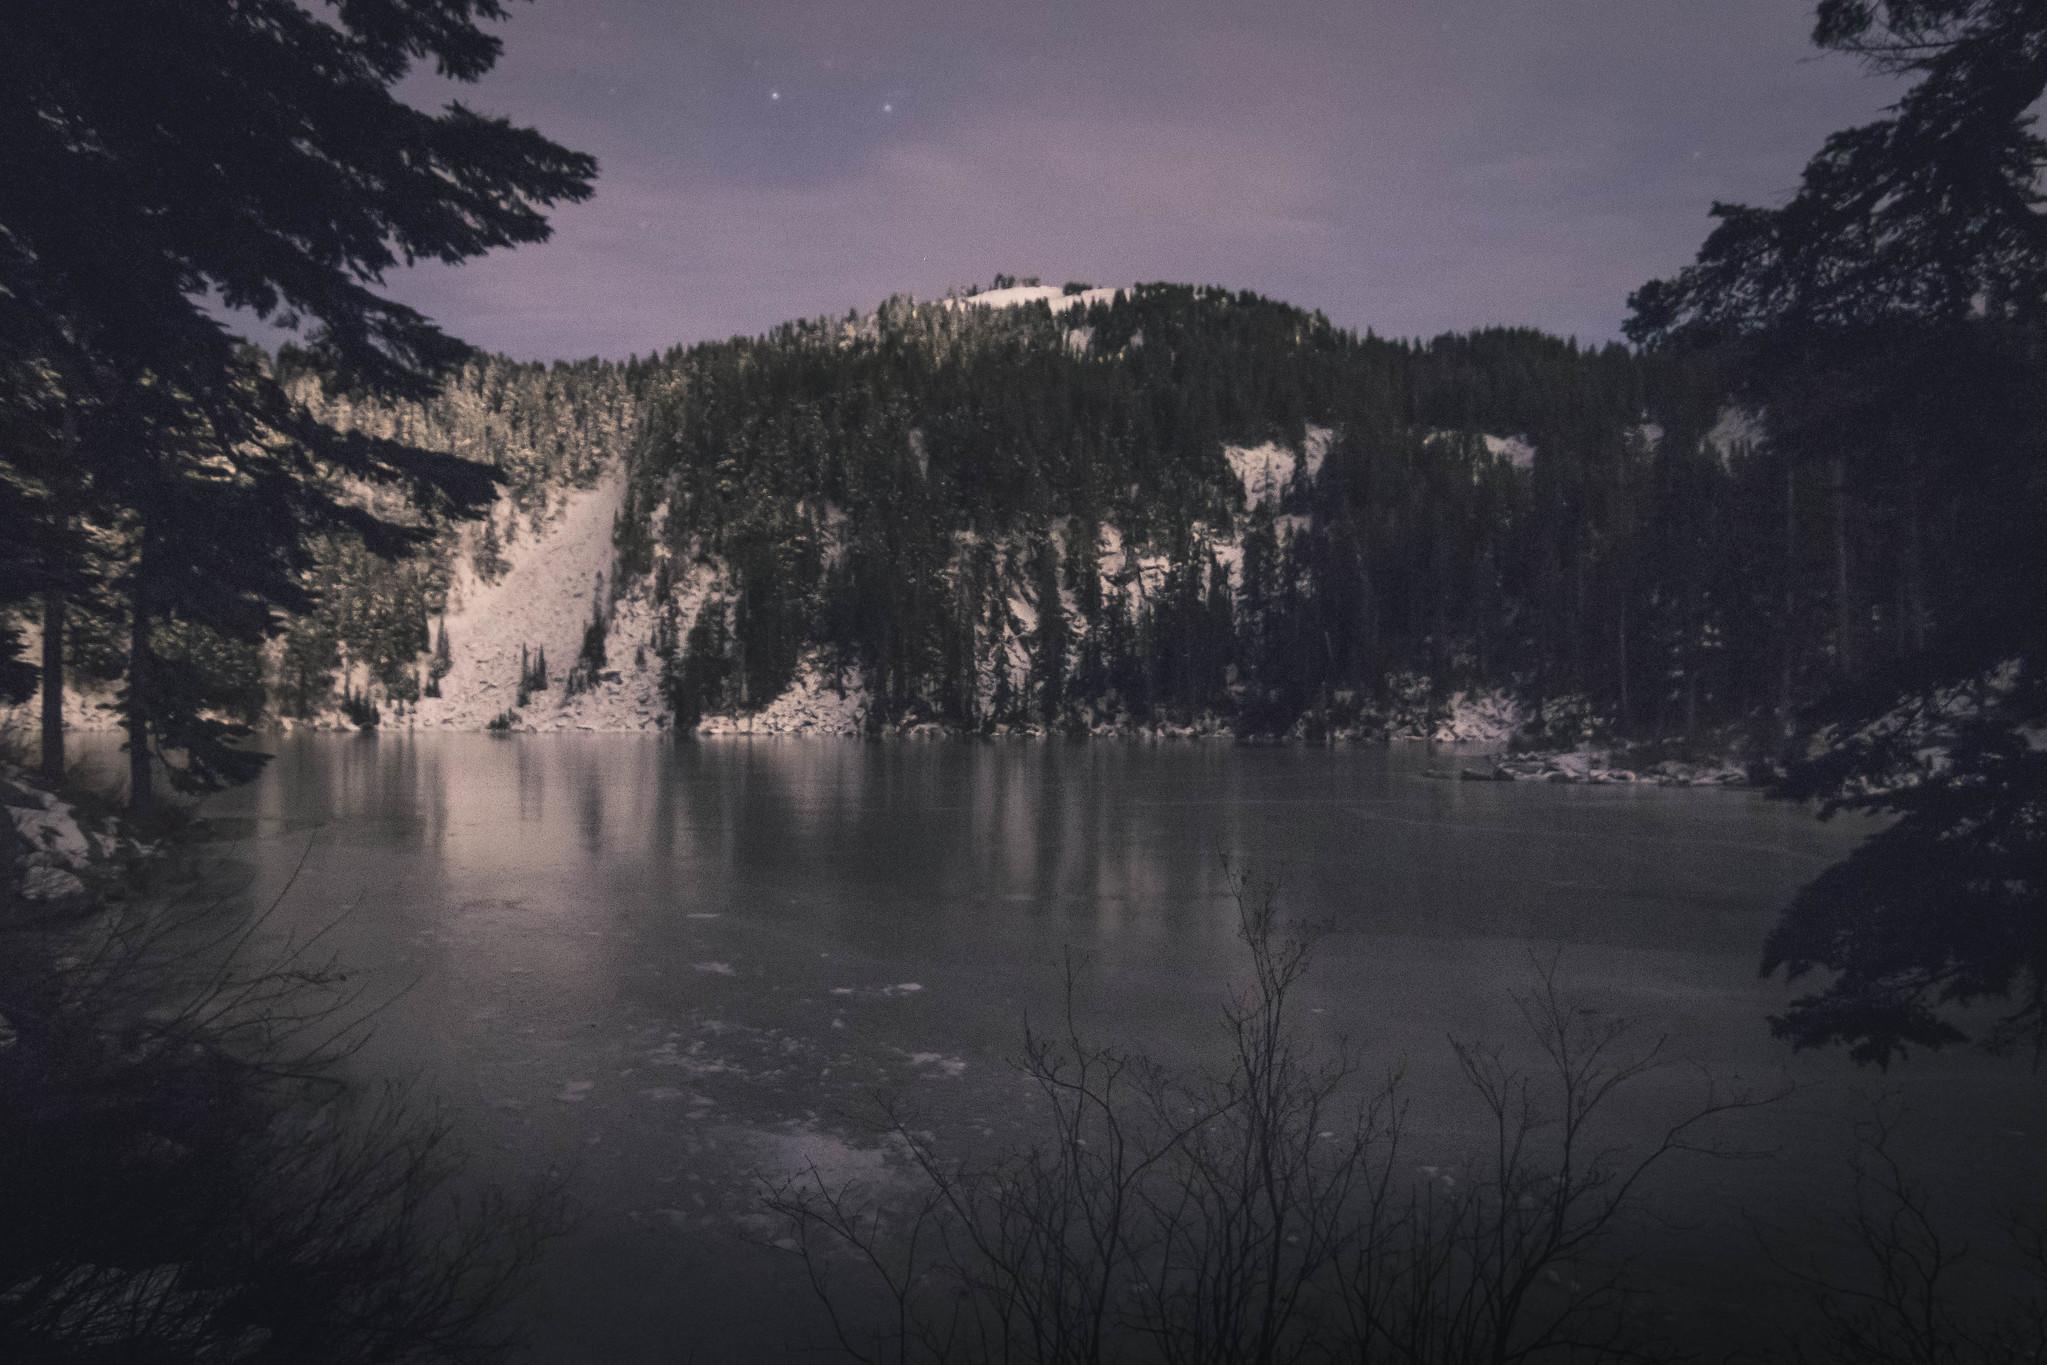 Mason Lake after dark